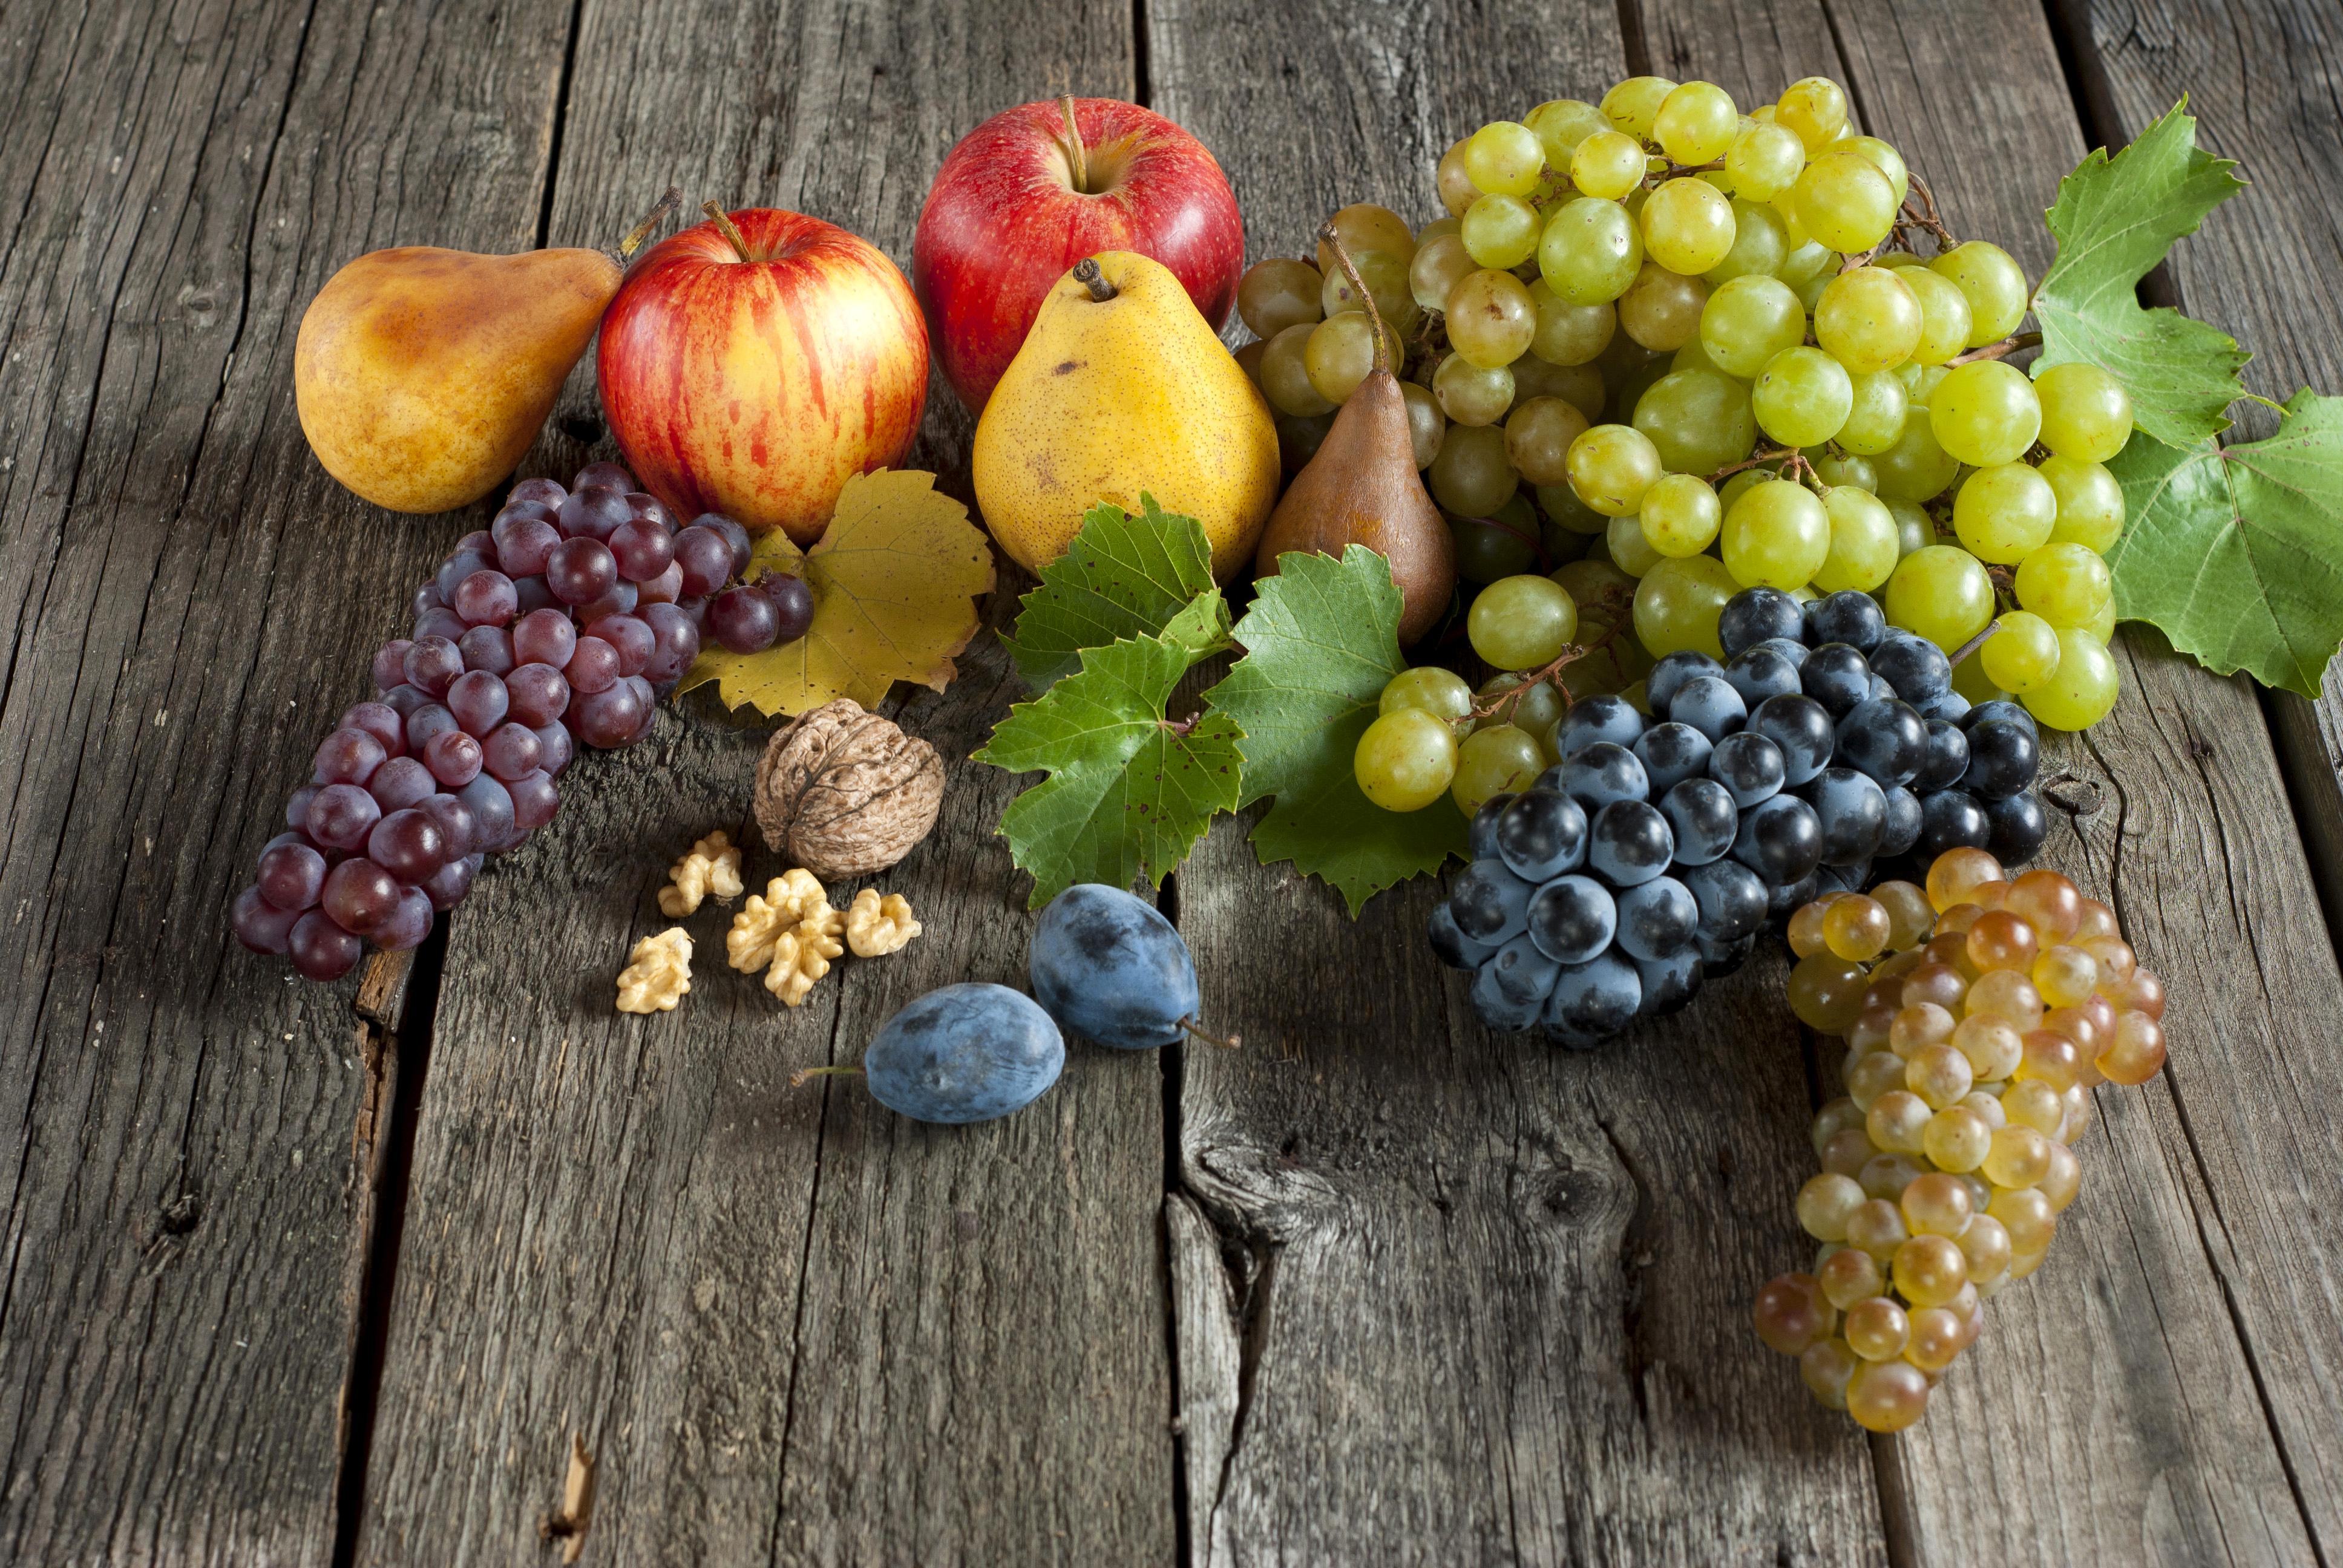 еда фрукты груша виноград корзина food fruit pear grapes basket без смс